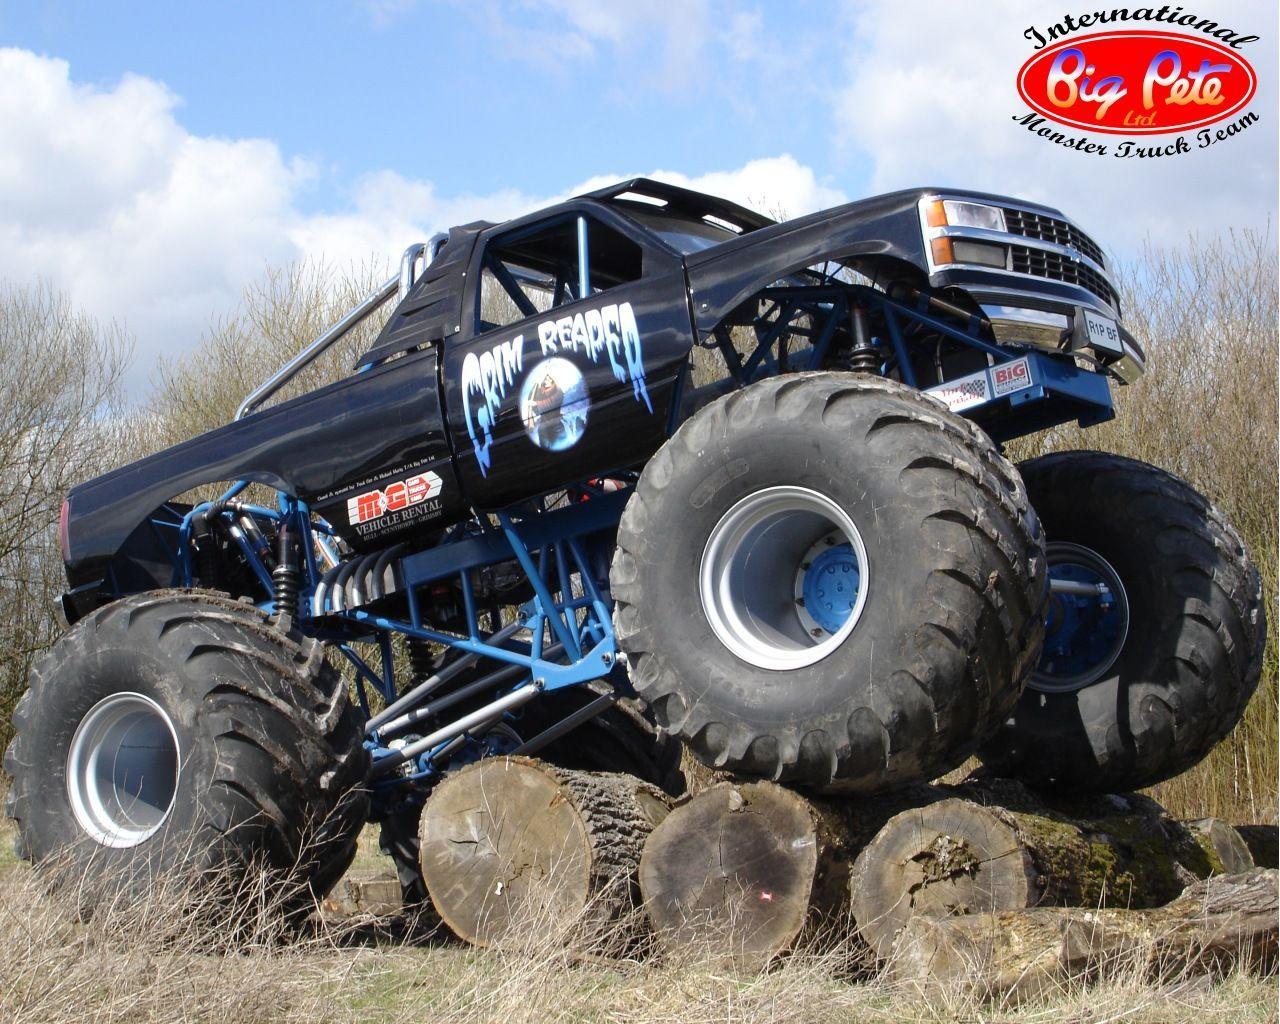 Monster Truck Wallpapers - Top Free